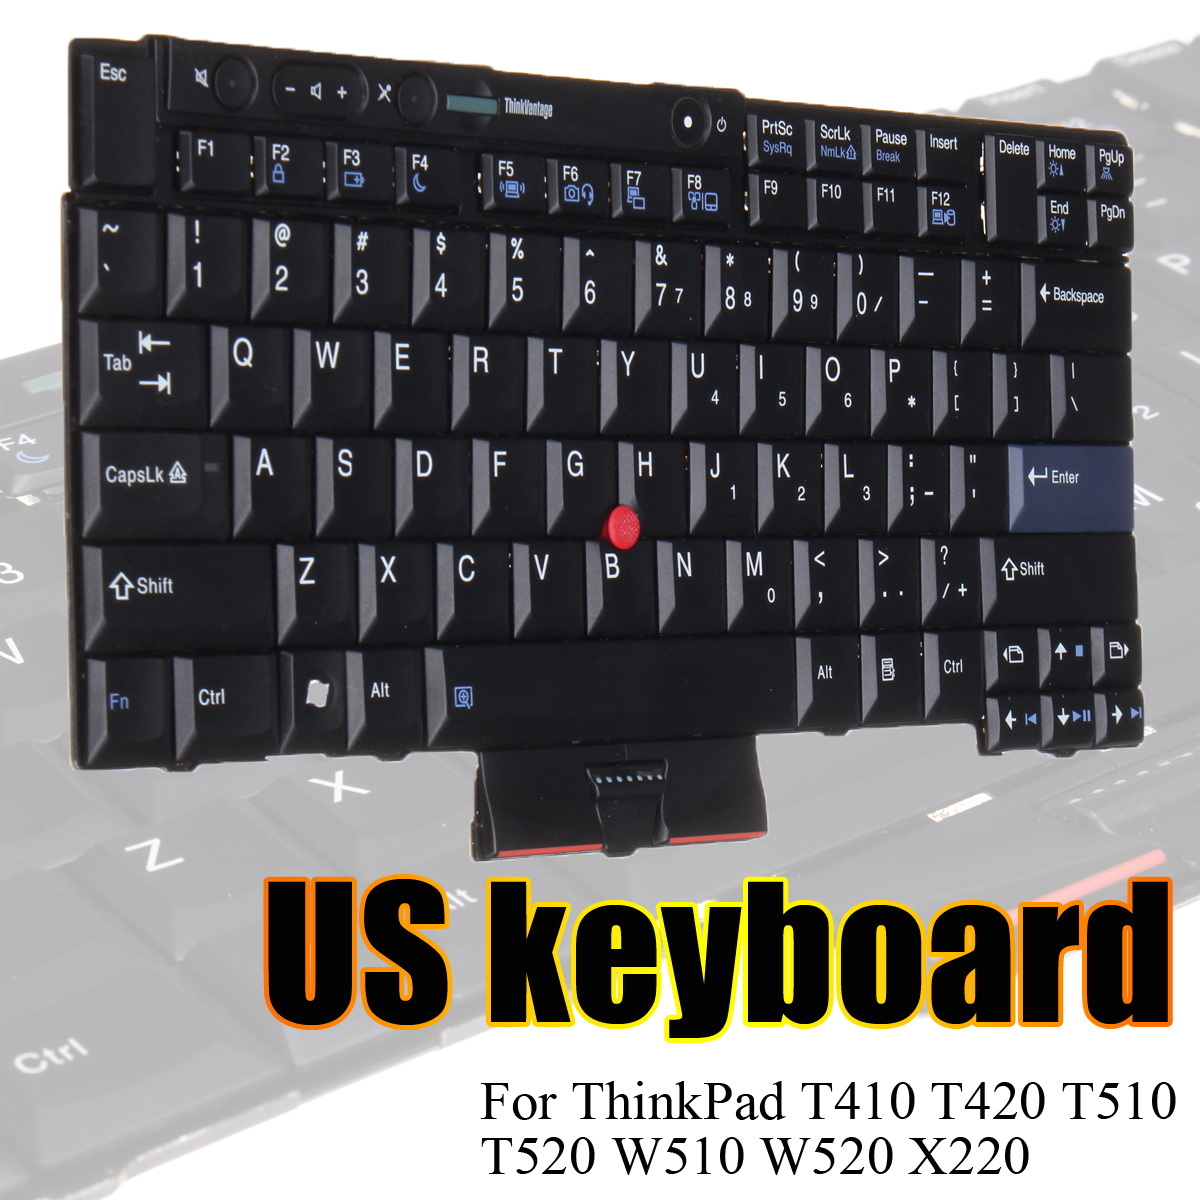 купить Black US Keyboard For Lenovo ThinkPad T410 T420 T510 T520 W510 W520 X220 Notebook Replacement Keyboards по цене 2232.36 рублей